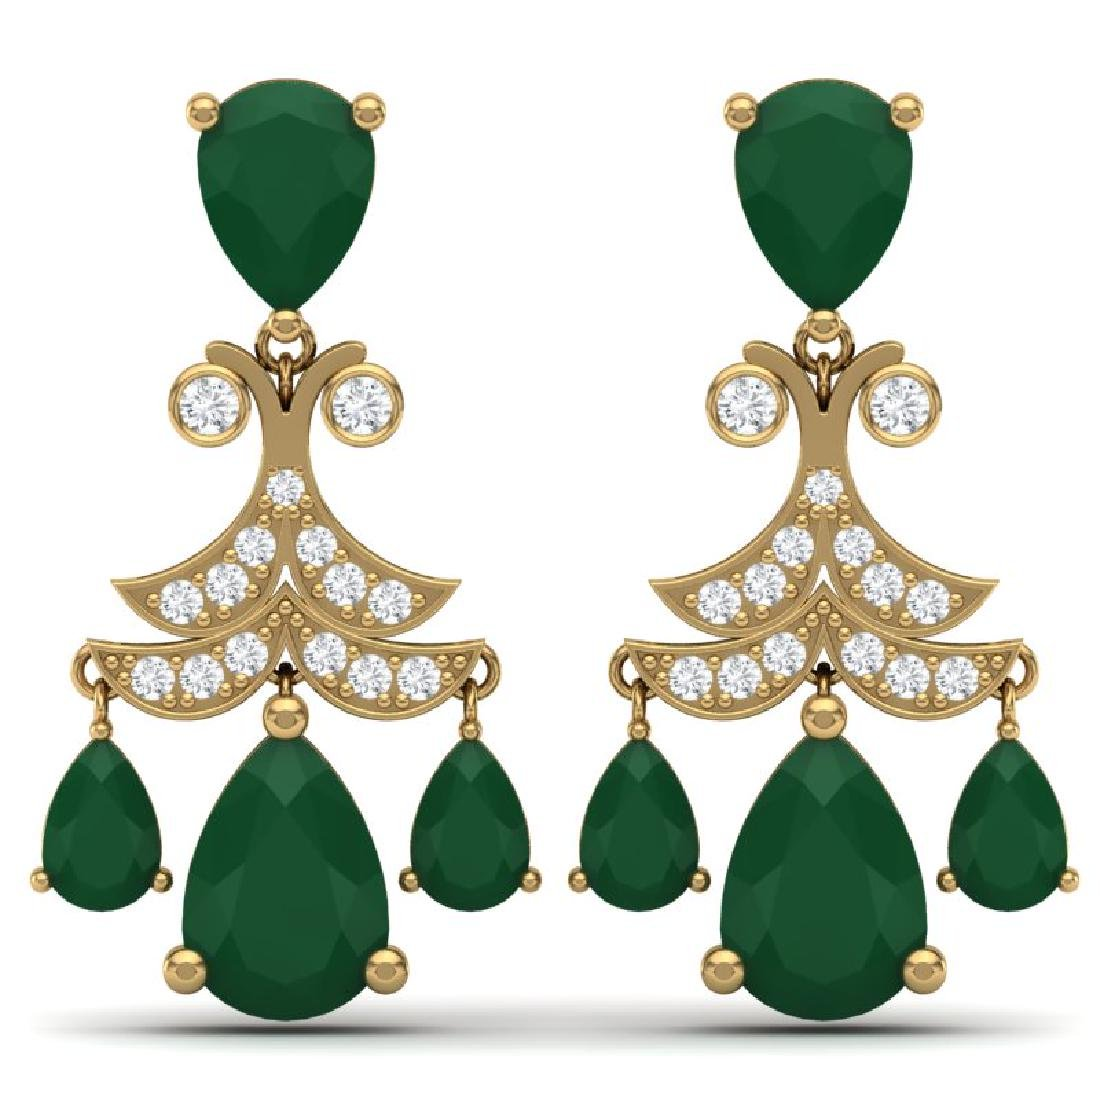 11.97 CTW Royalty Emerald & VS Diamond Earrings 18K